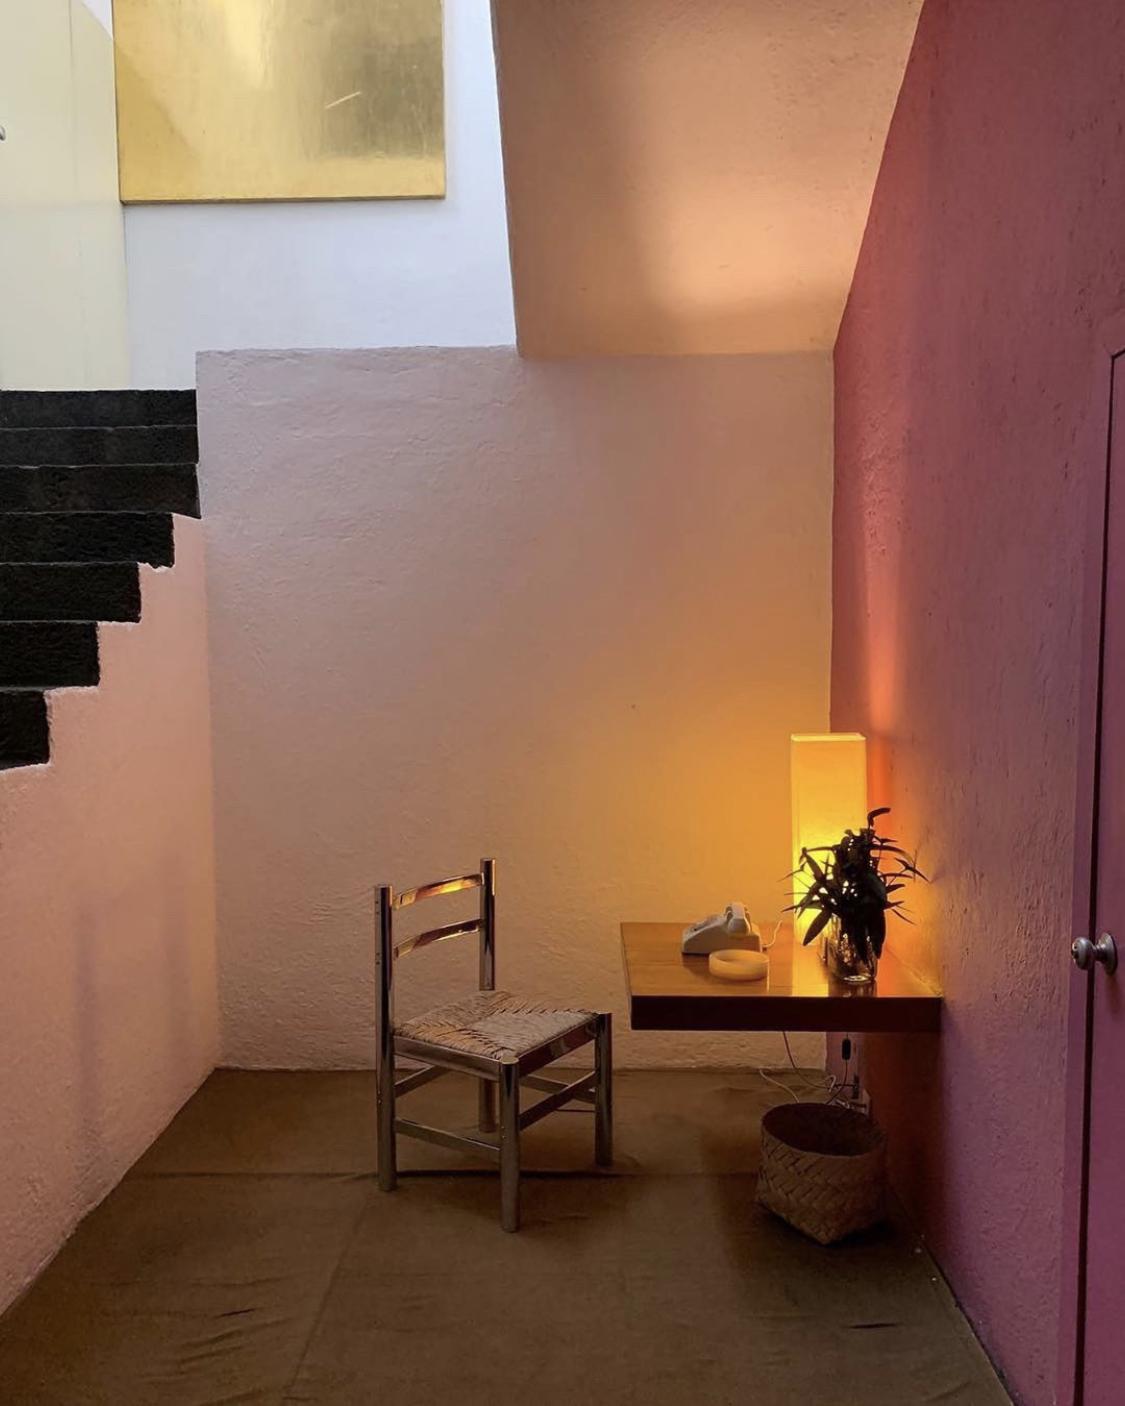 Luis Barragán House and Studio, Mexico City